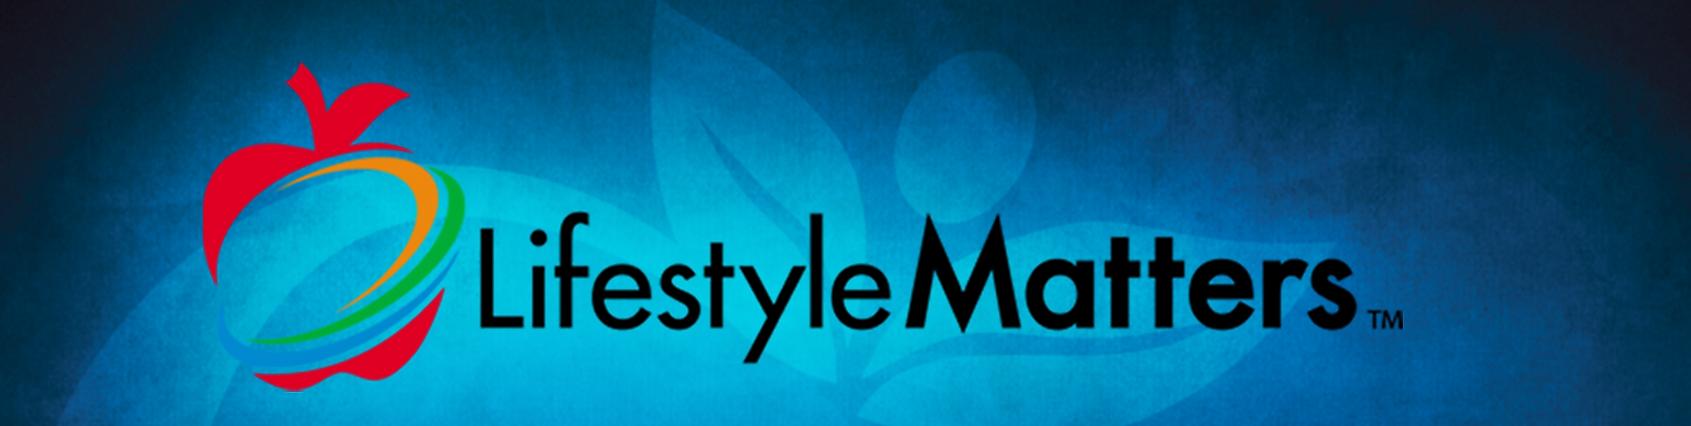 LifestyleWebHeader2400.png